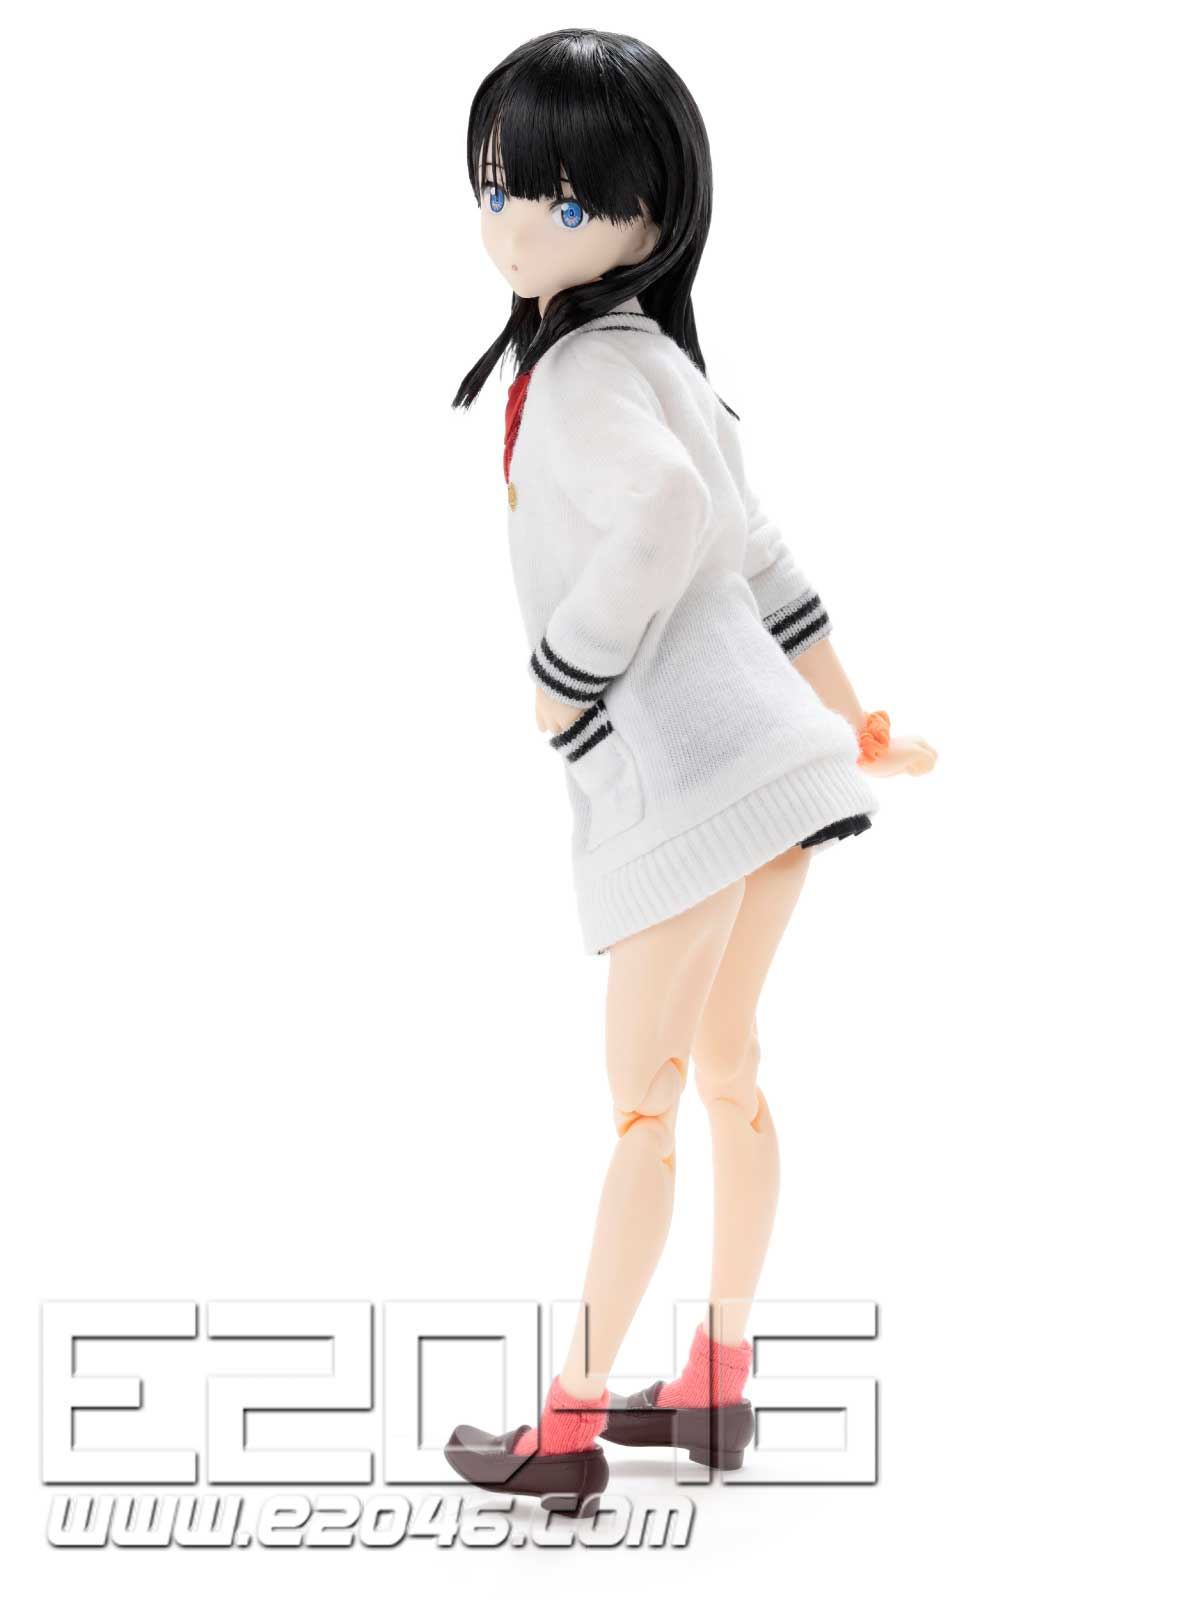 Takarada Rikka (DOLL)